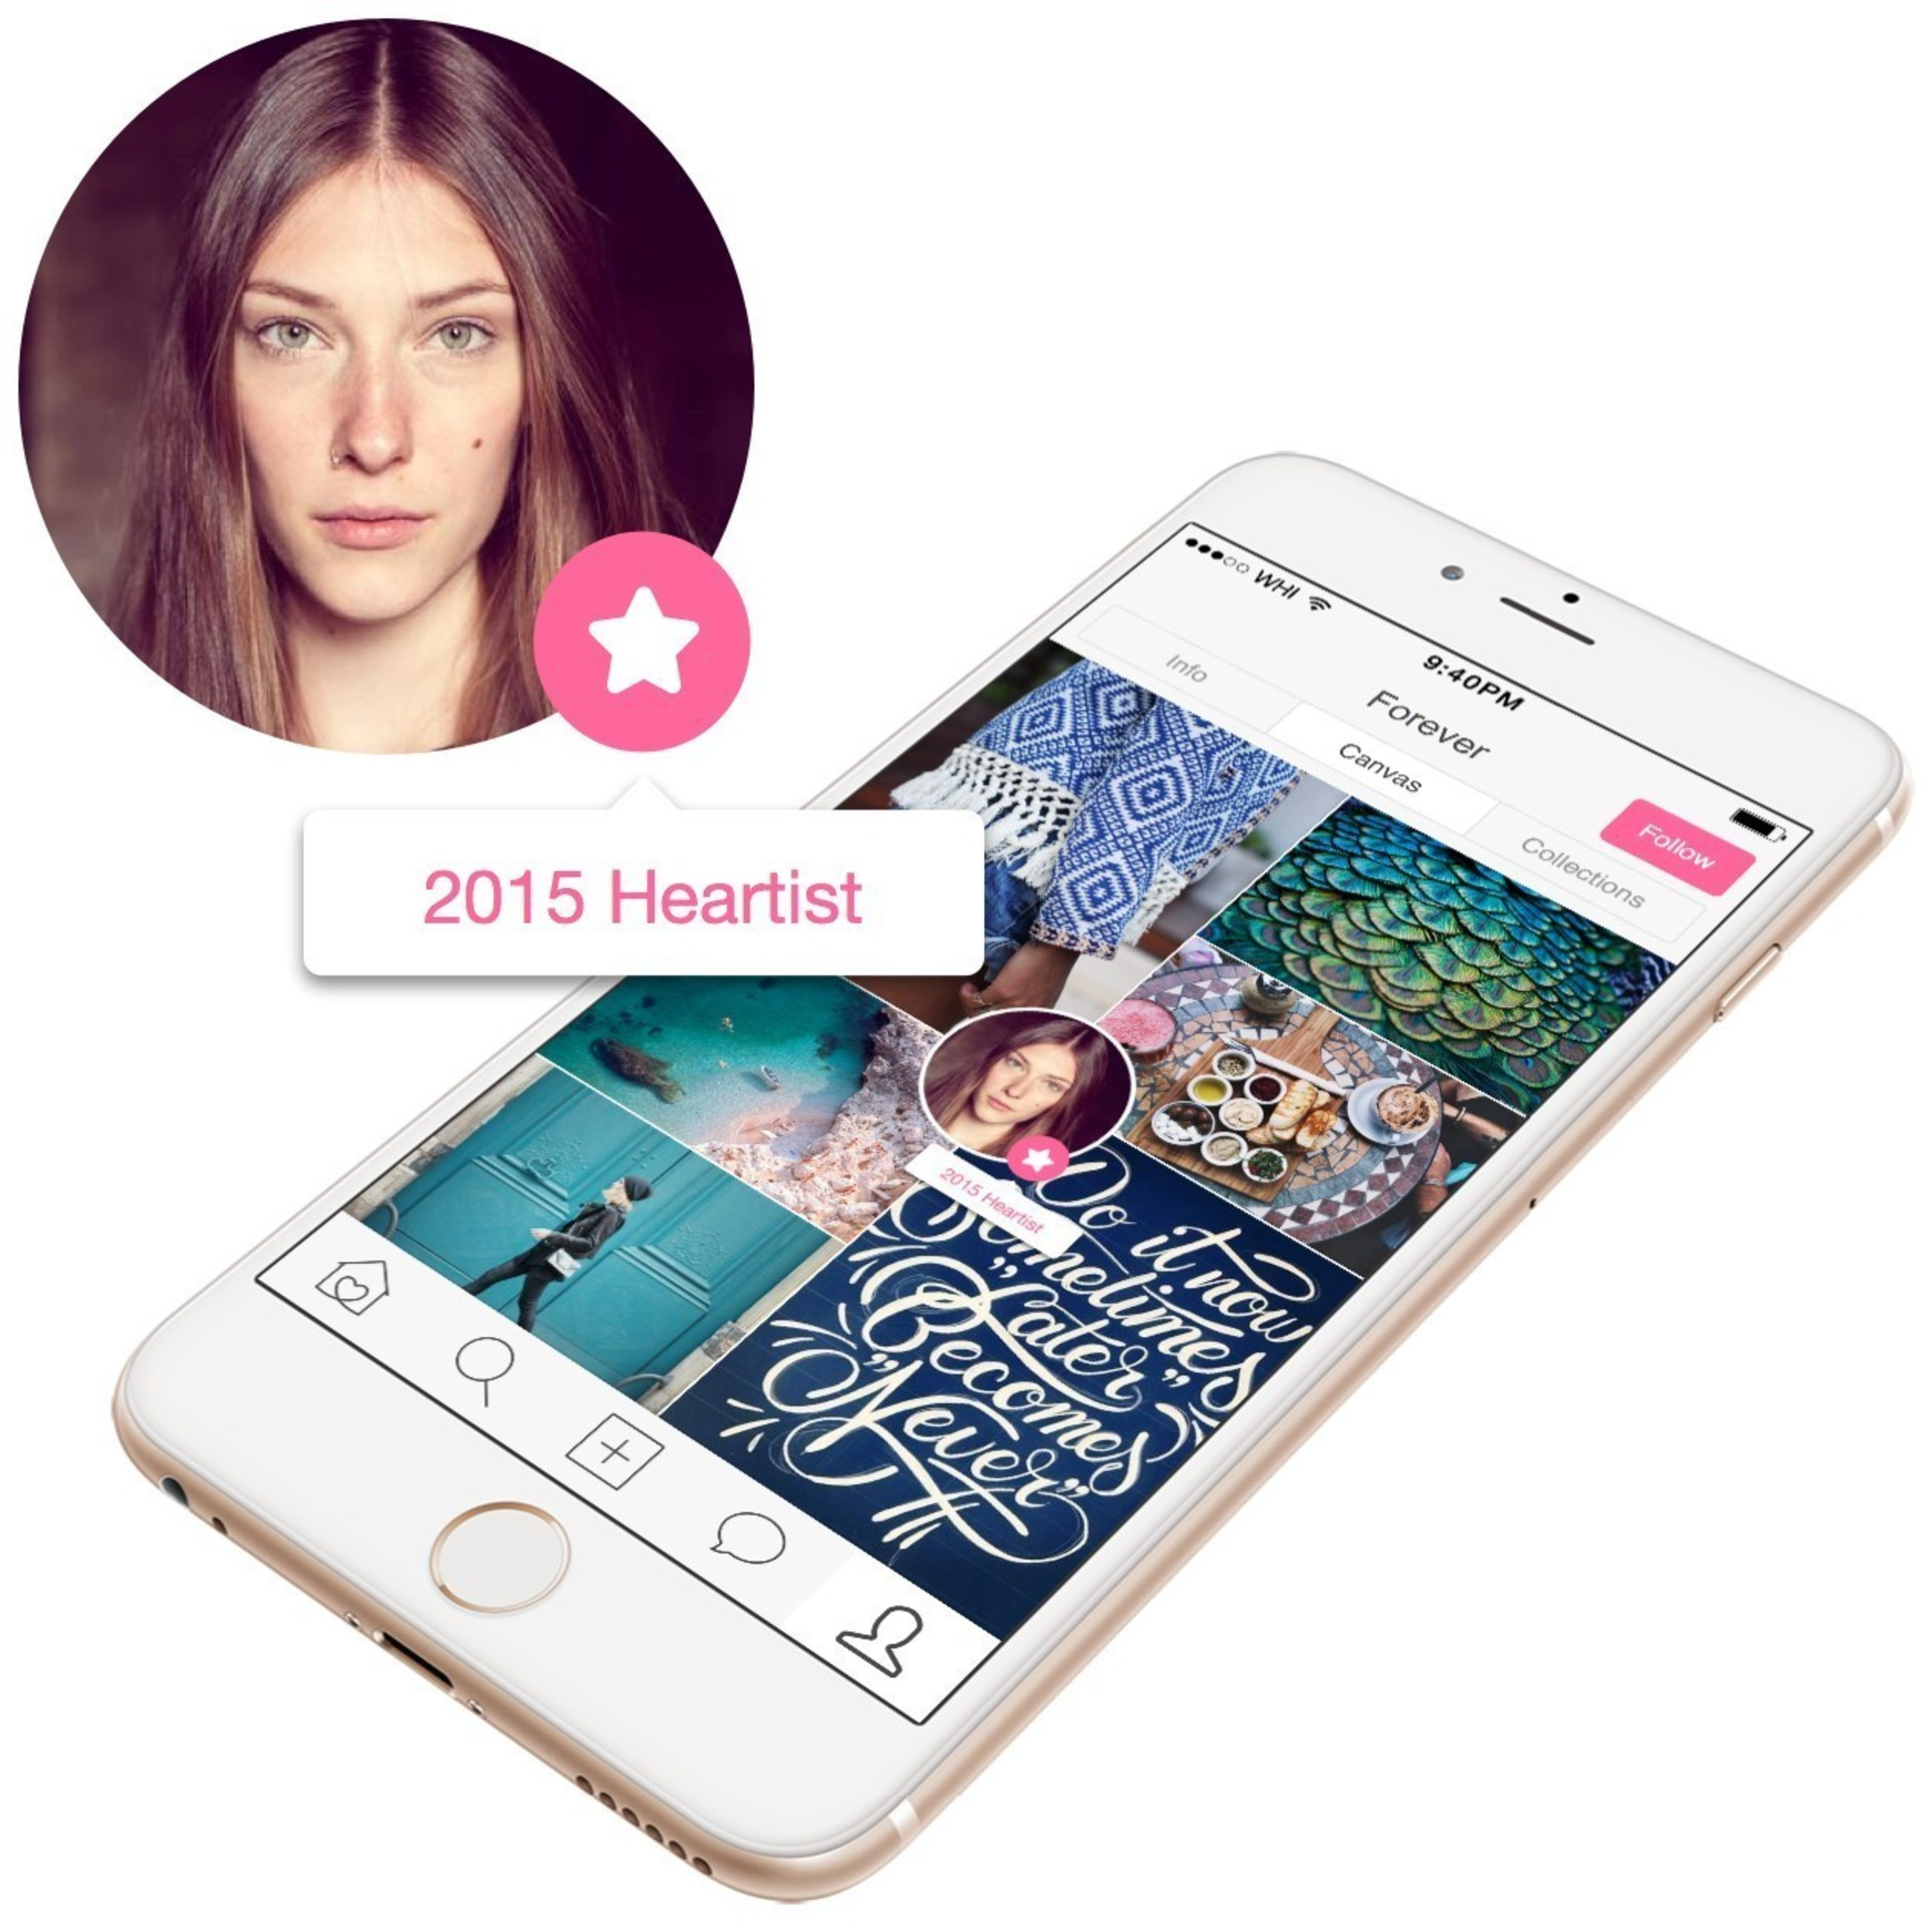 We Heart It Announces Launch of Heartist Program